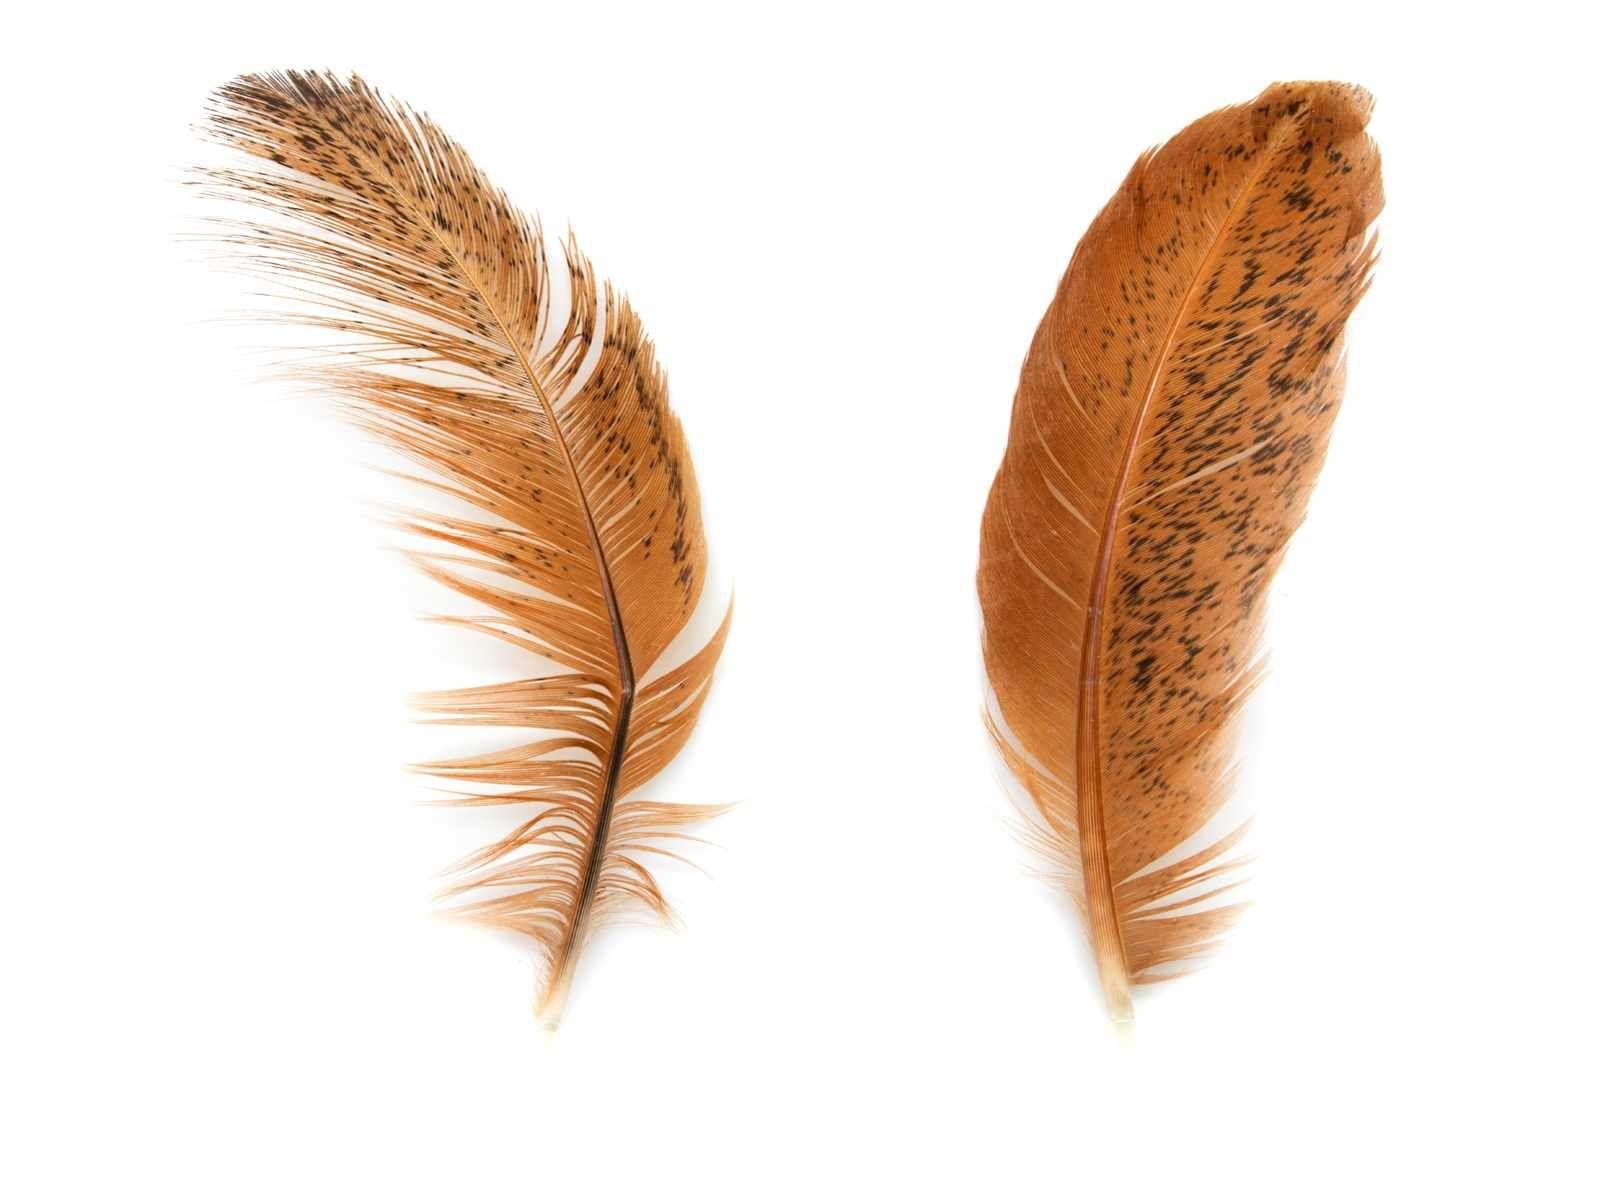 Feather Hd Desktop Wallpaper Free White Feather Wallpaper